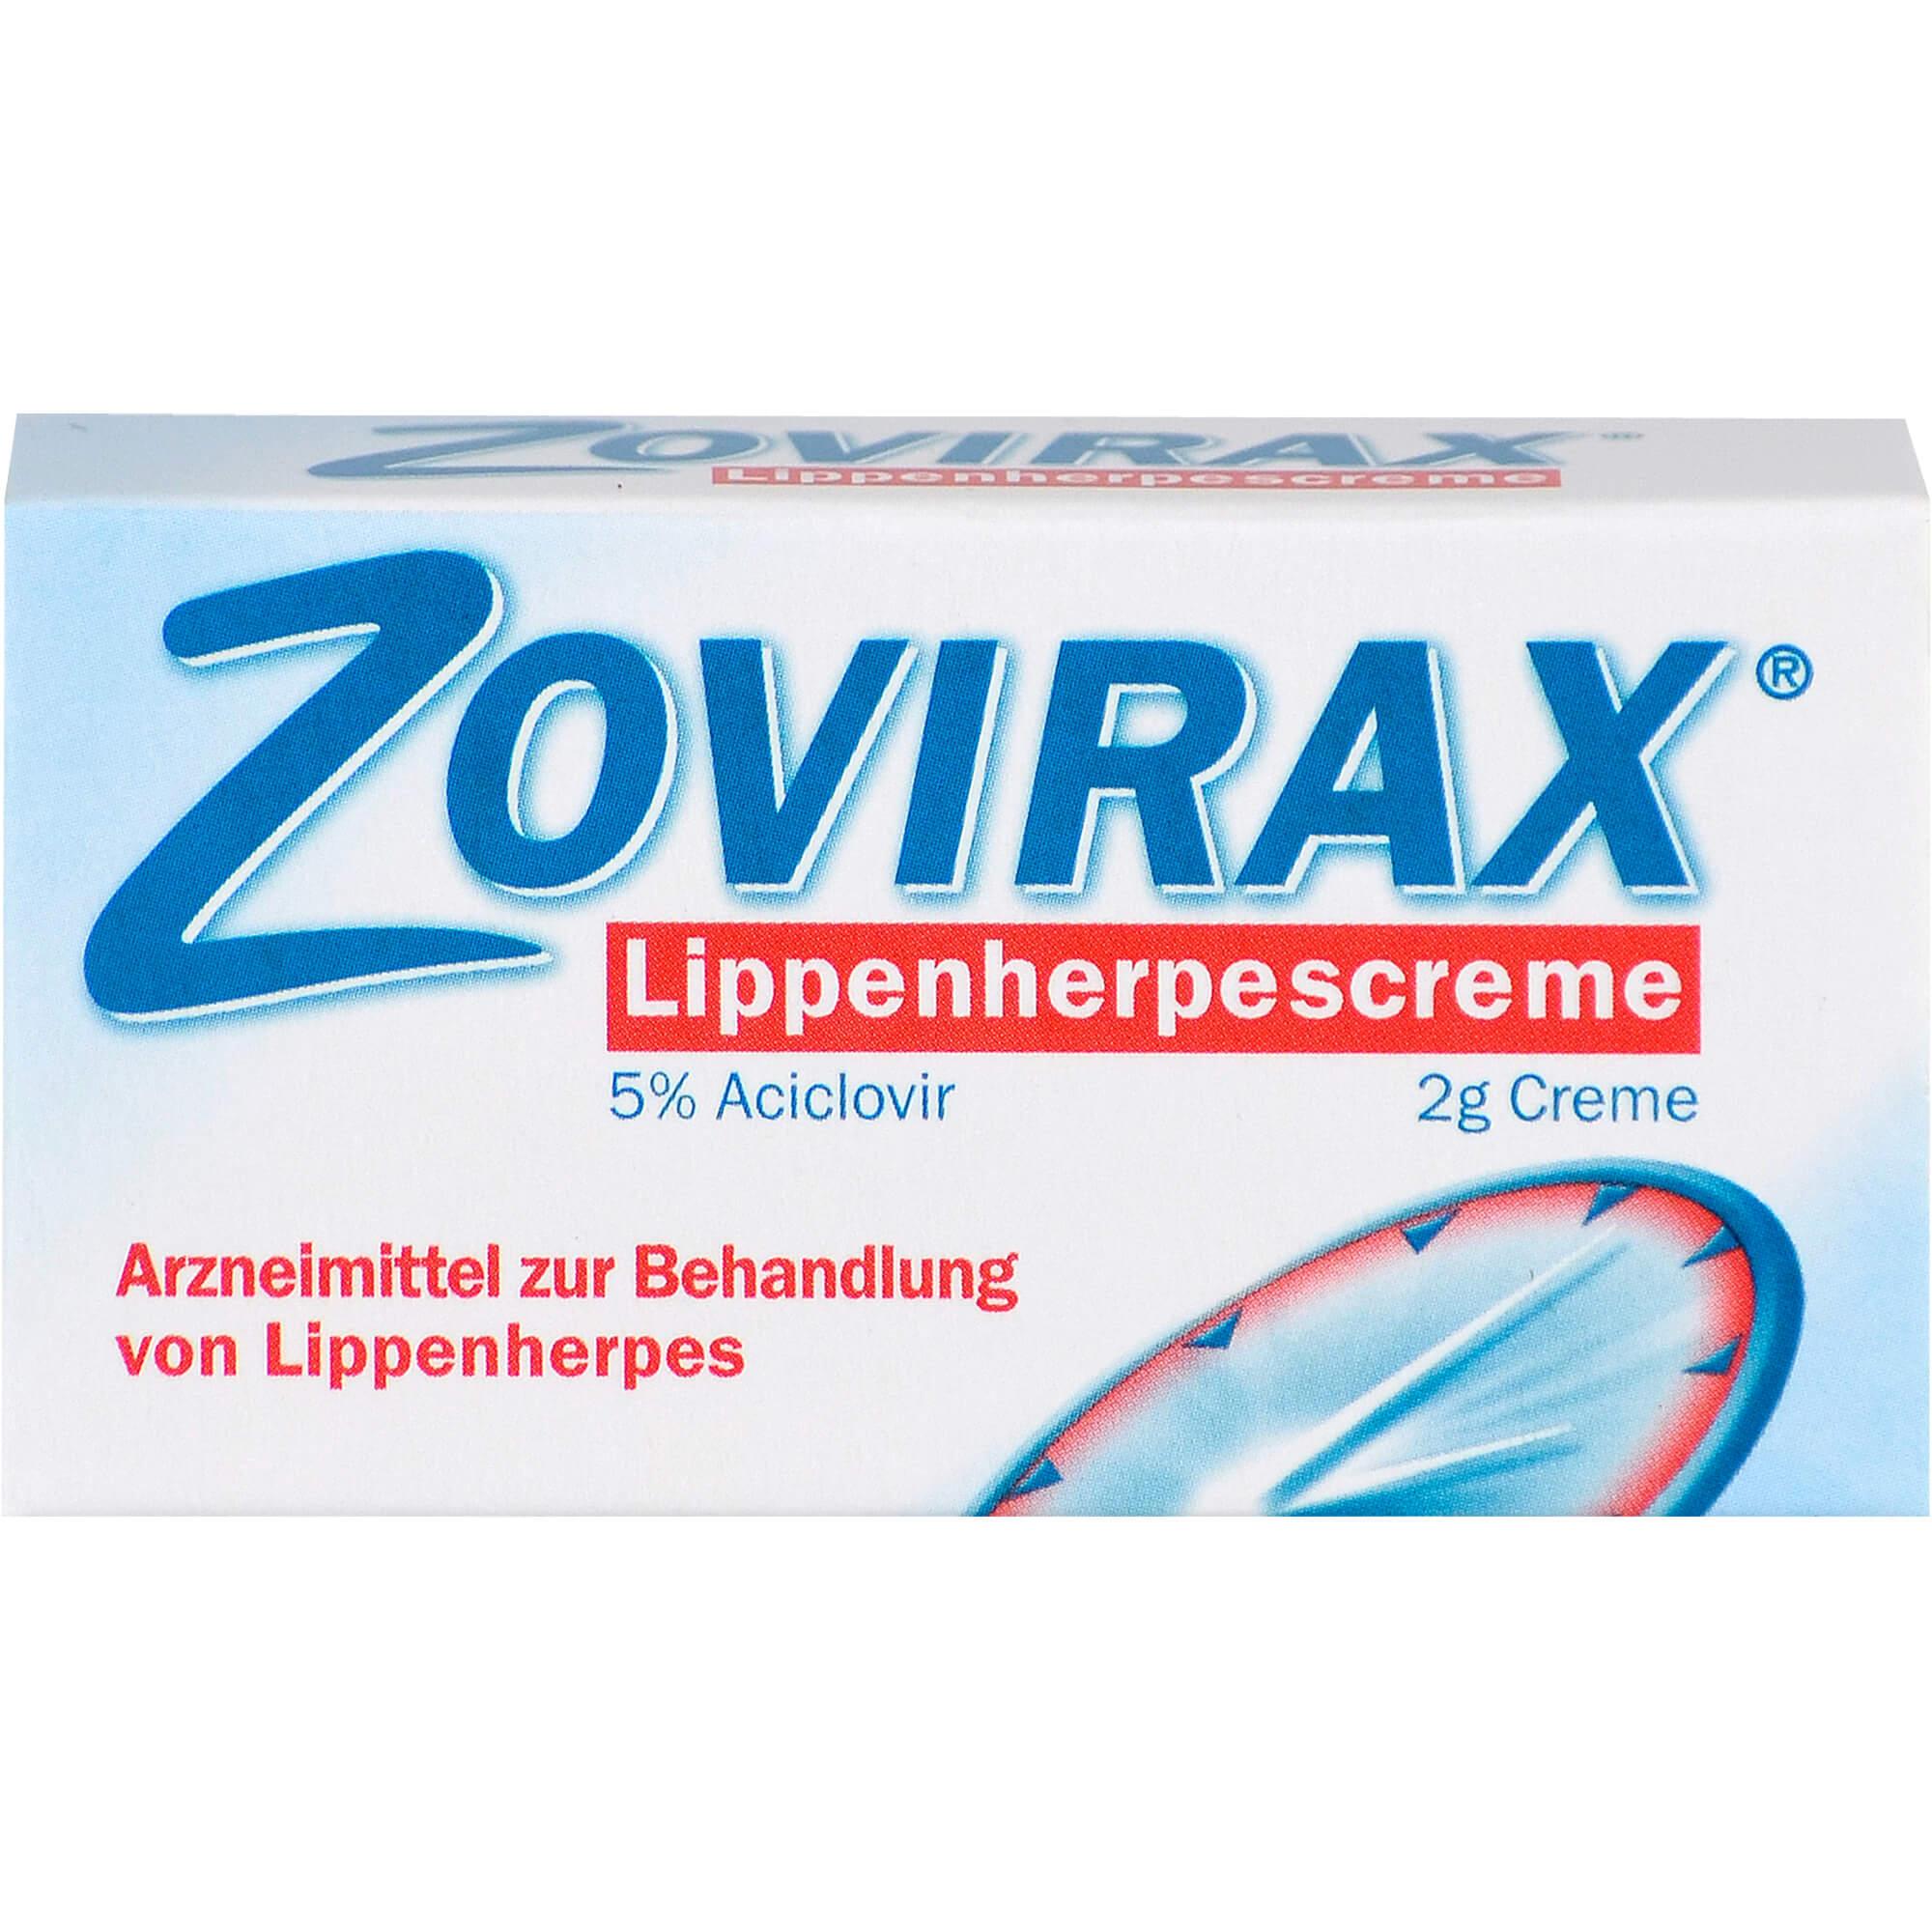 ZOVIRAX-Lippenherpes-Creme